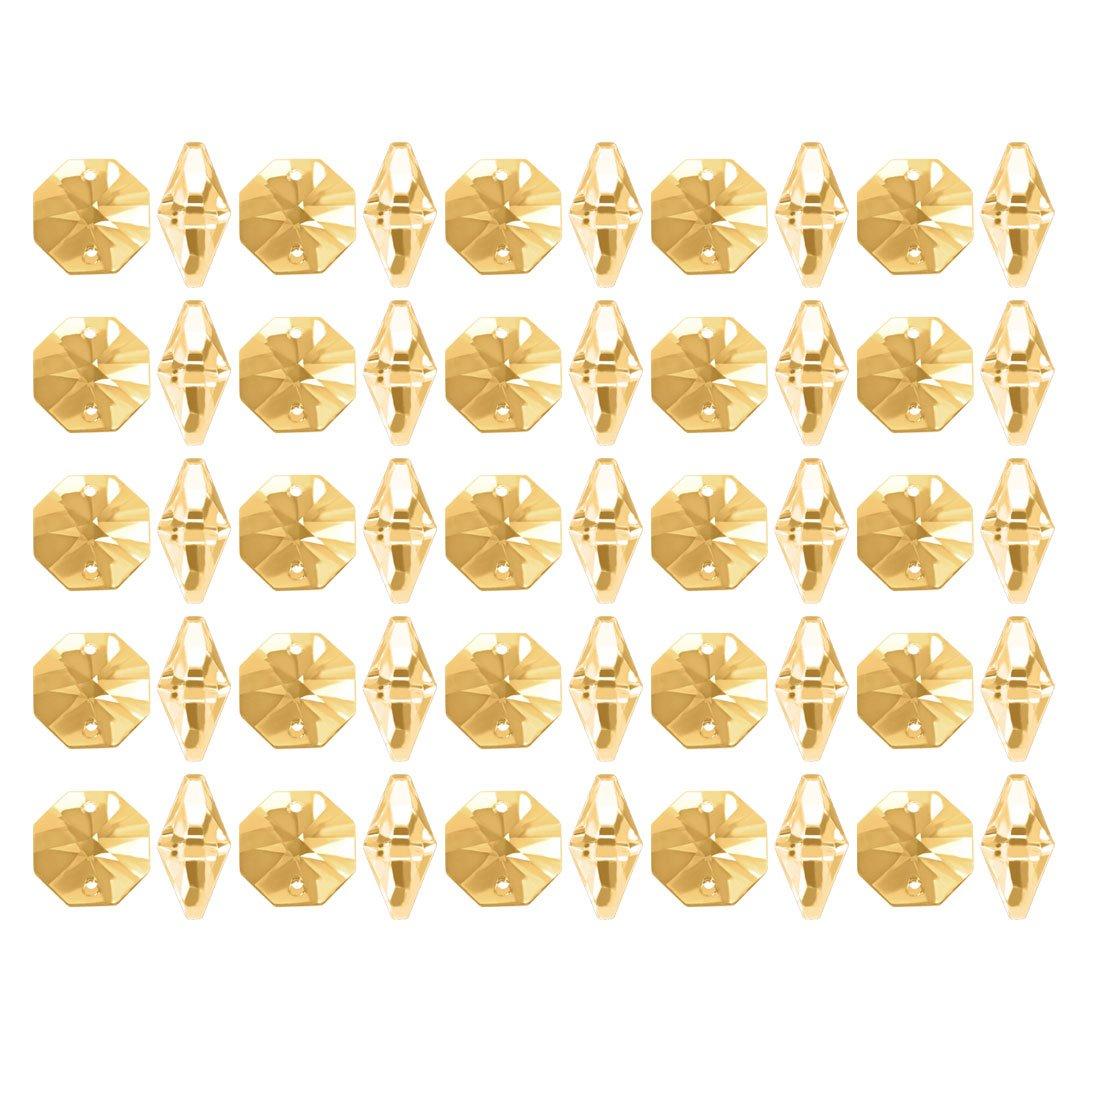 Amazon com: uxcell 50Pcs Crystal Glass Beads Amber Octagonal